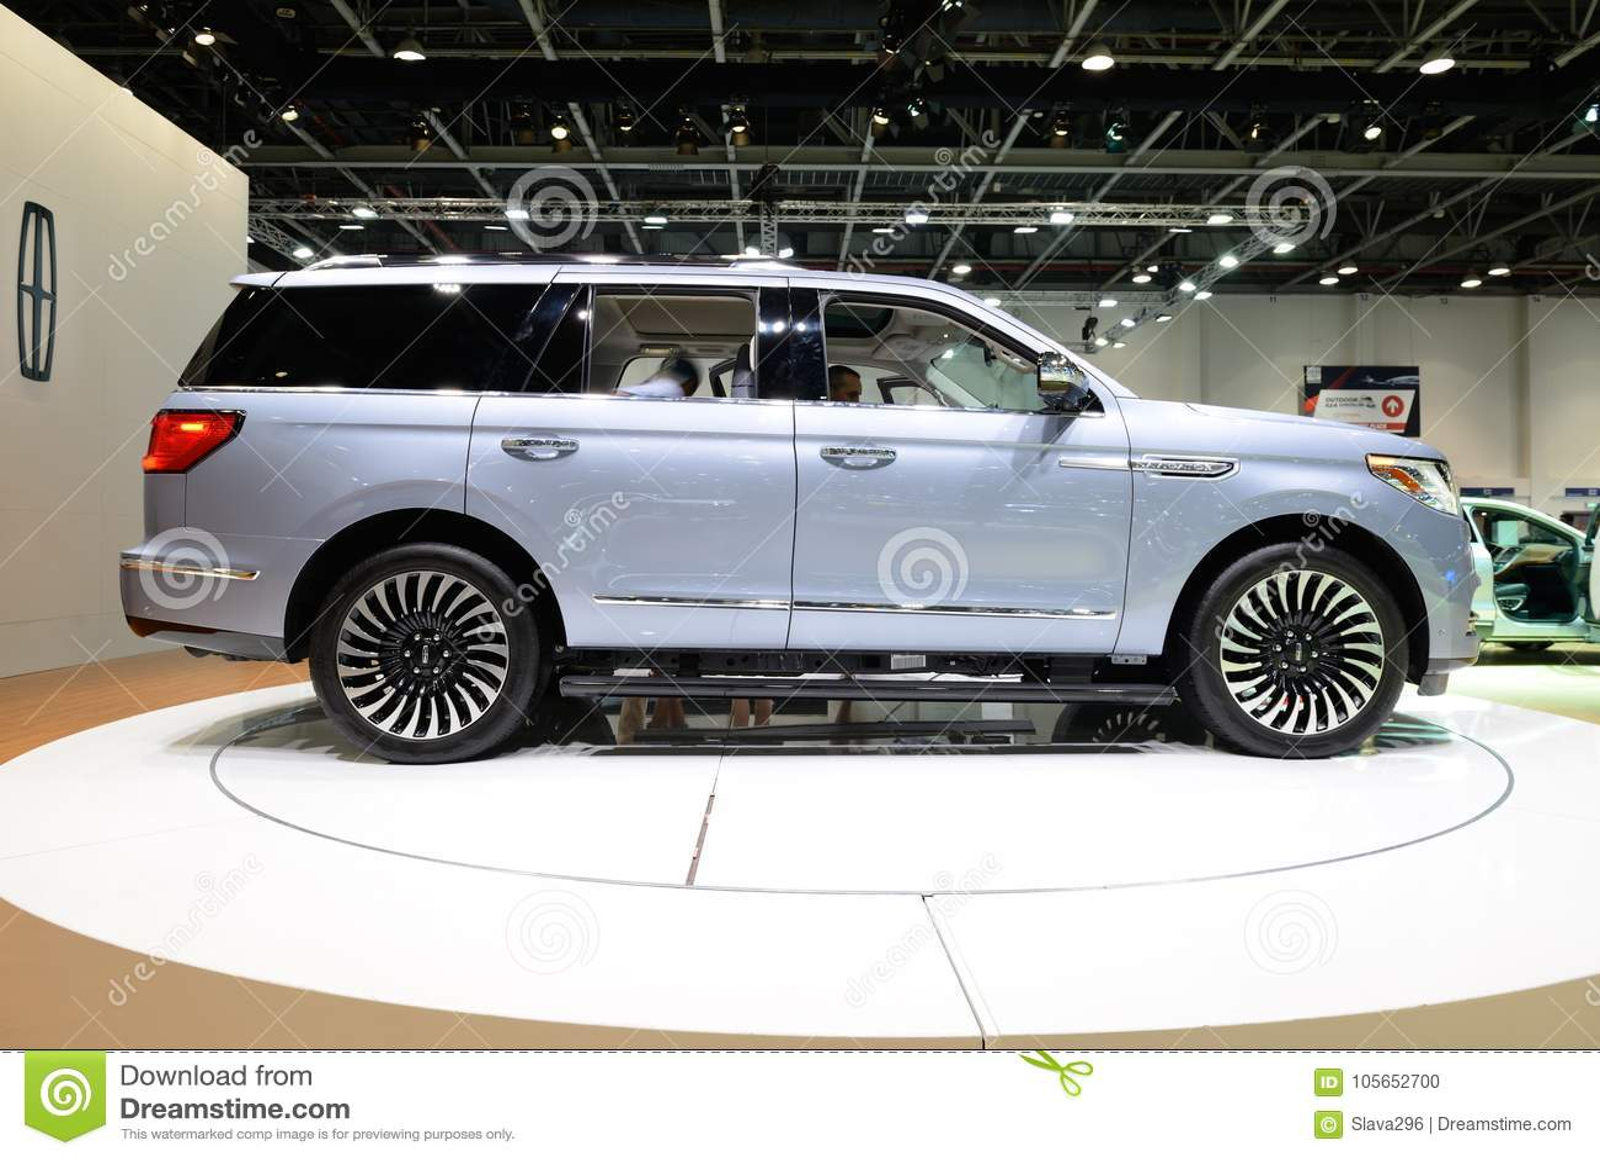 The Lincoln Navigator Car Is On Dubai Motor Show 2017 Editorial